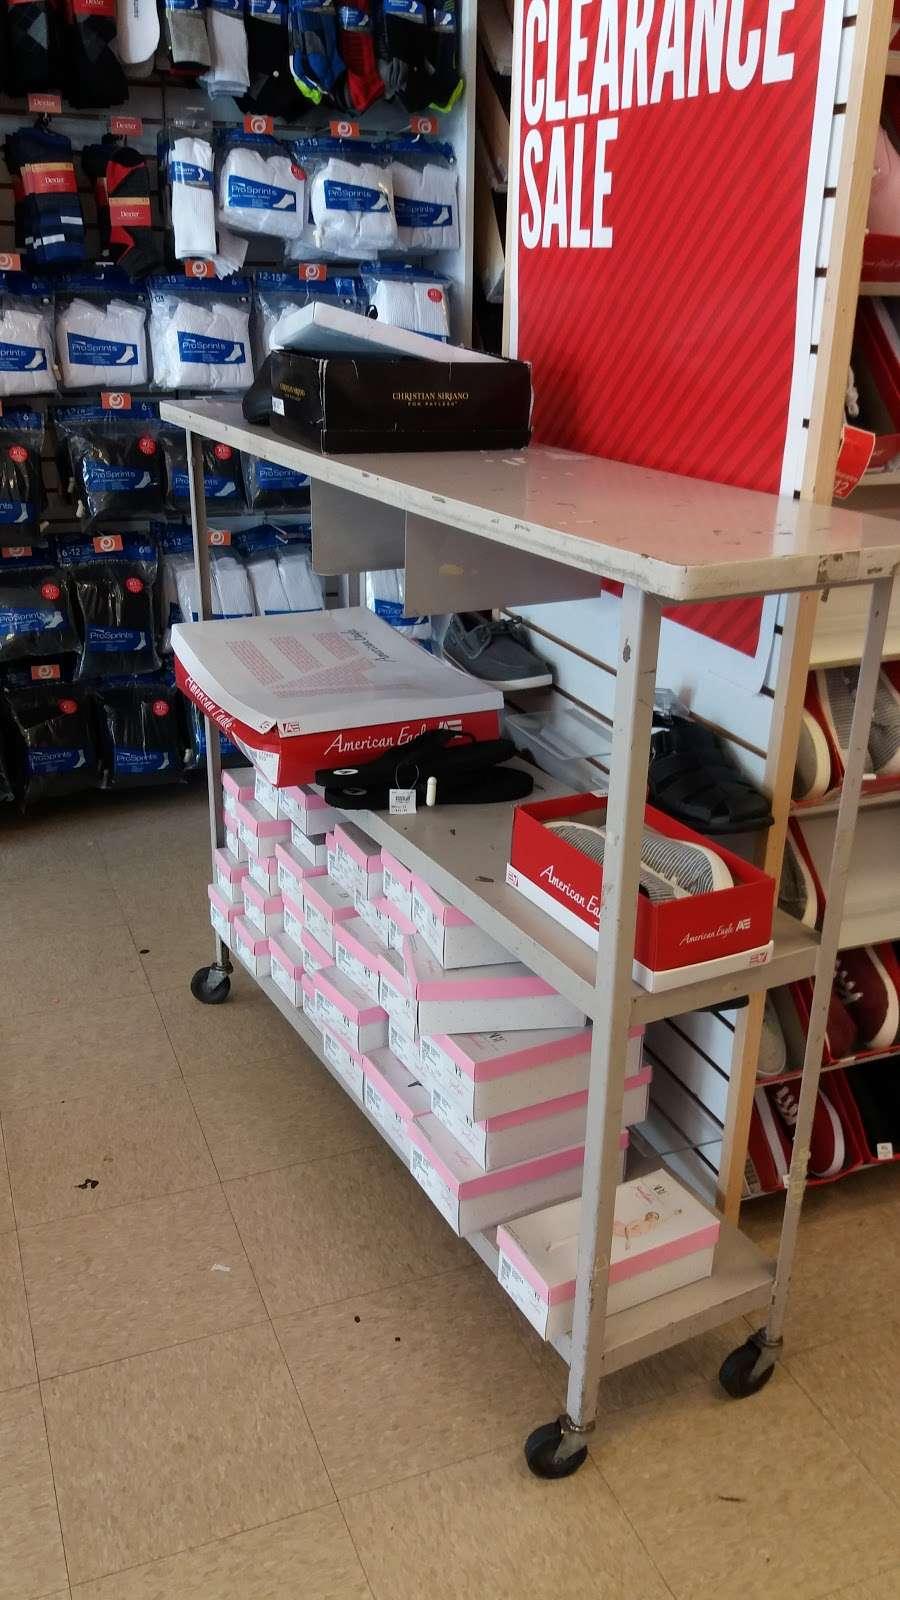 Payless ShoeSource - shoe store  | Photo 3 of 5 | Address: 2260 Bartow Ave, Bronx, NY 10475, USA | Phone: (718) 379-5894